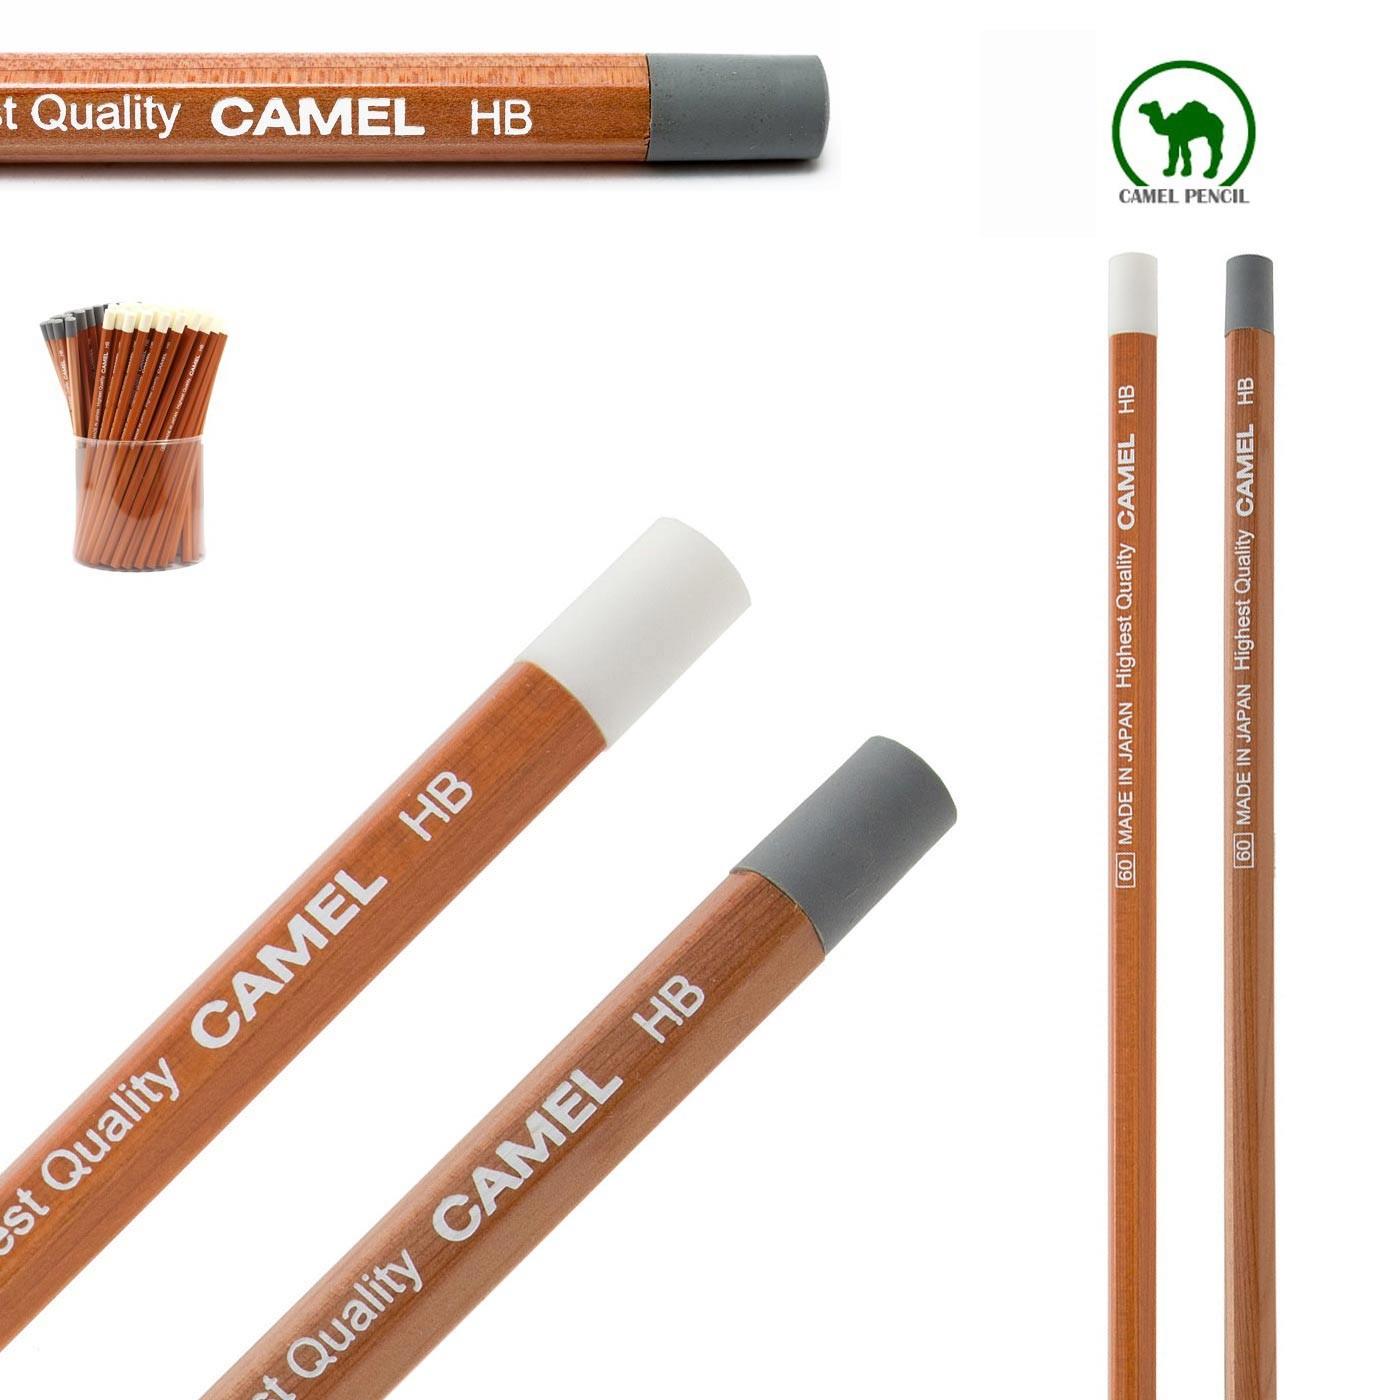 Camel Pencil Company